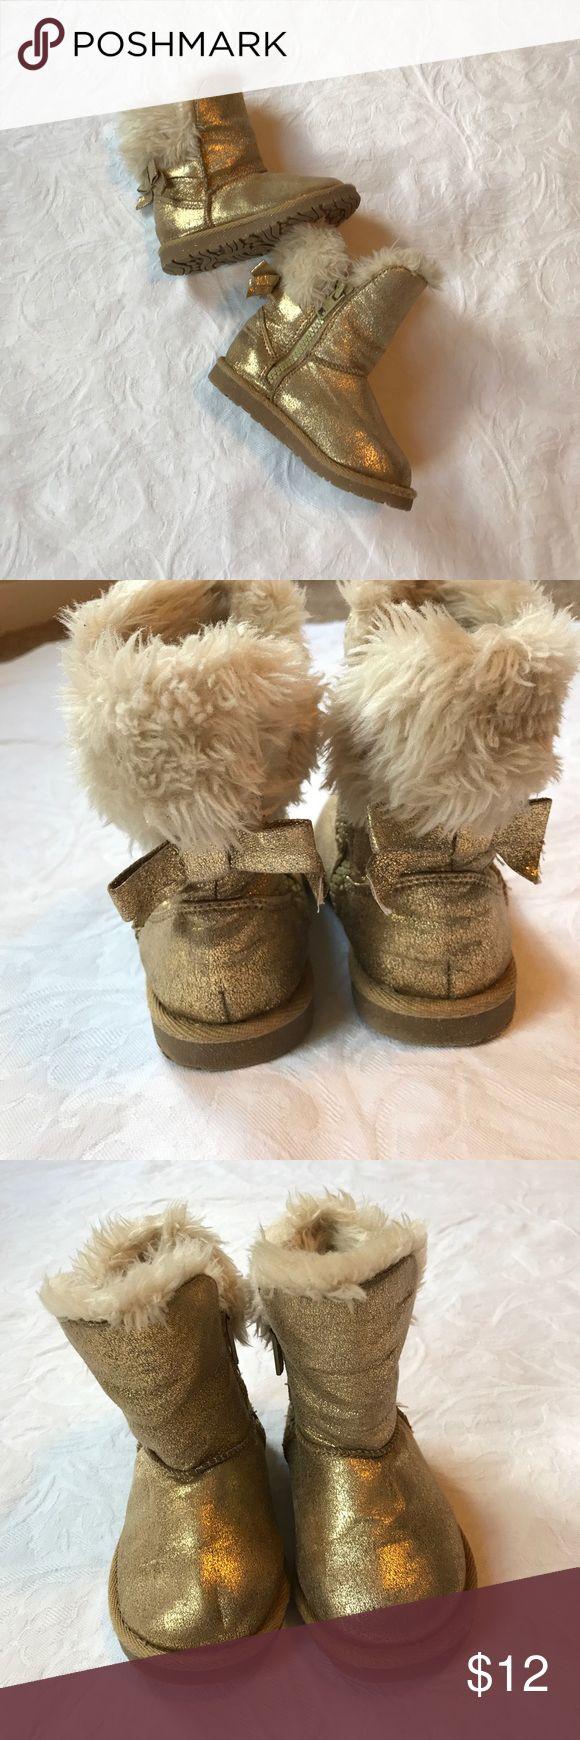 Target boots Gold Fur Size 6 Toddler Target boots Gold Fur Size 6 Toddler used good condition very warm Target Shoes Rain & Snow Boots